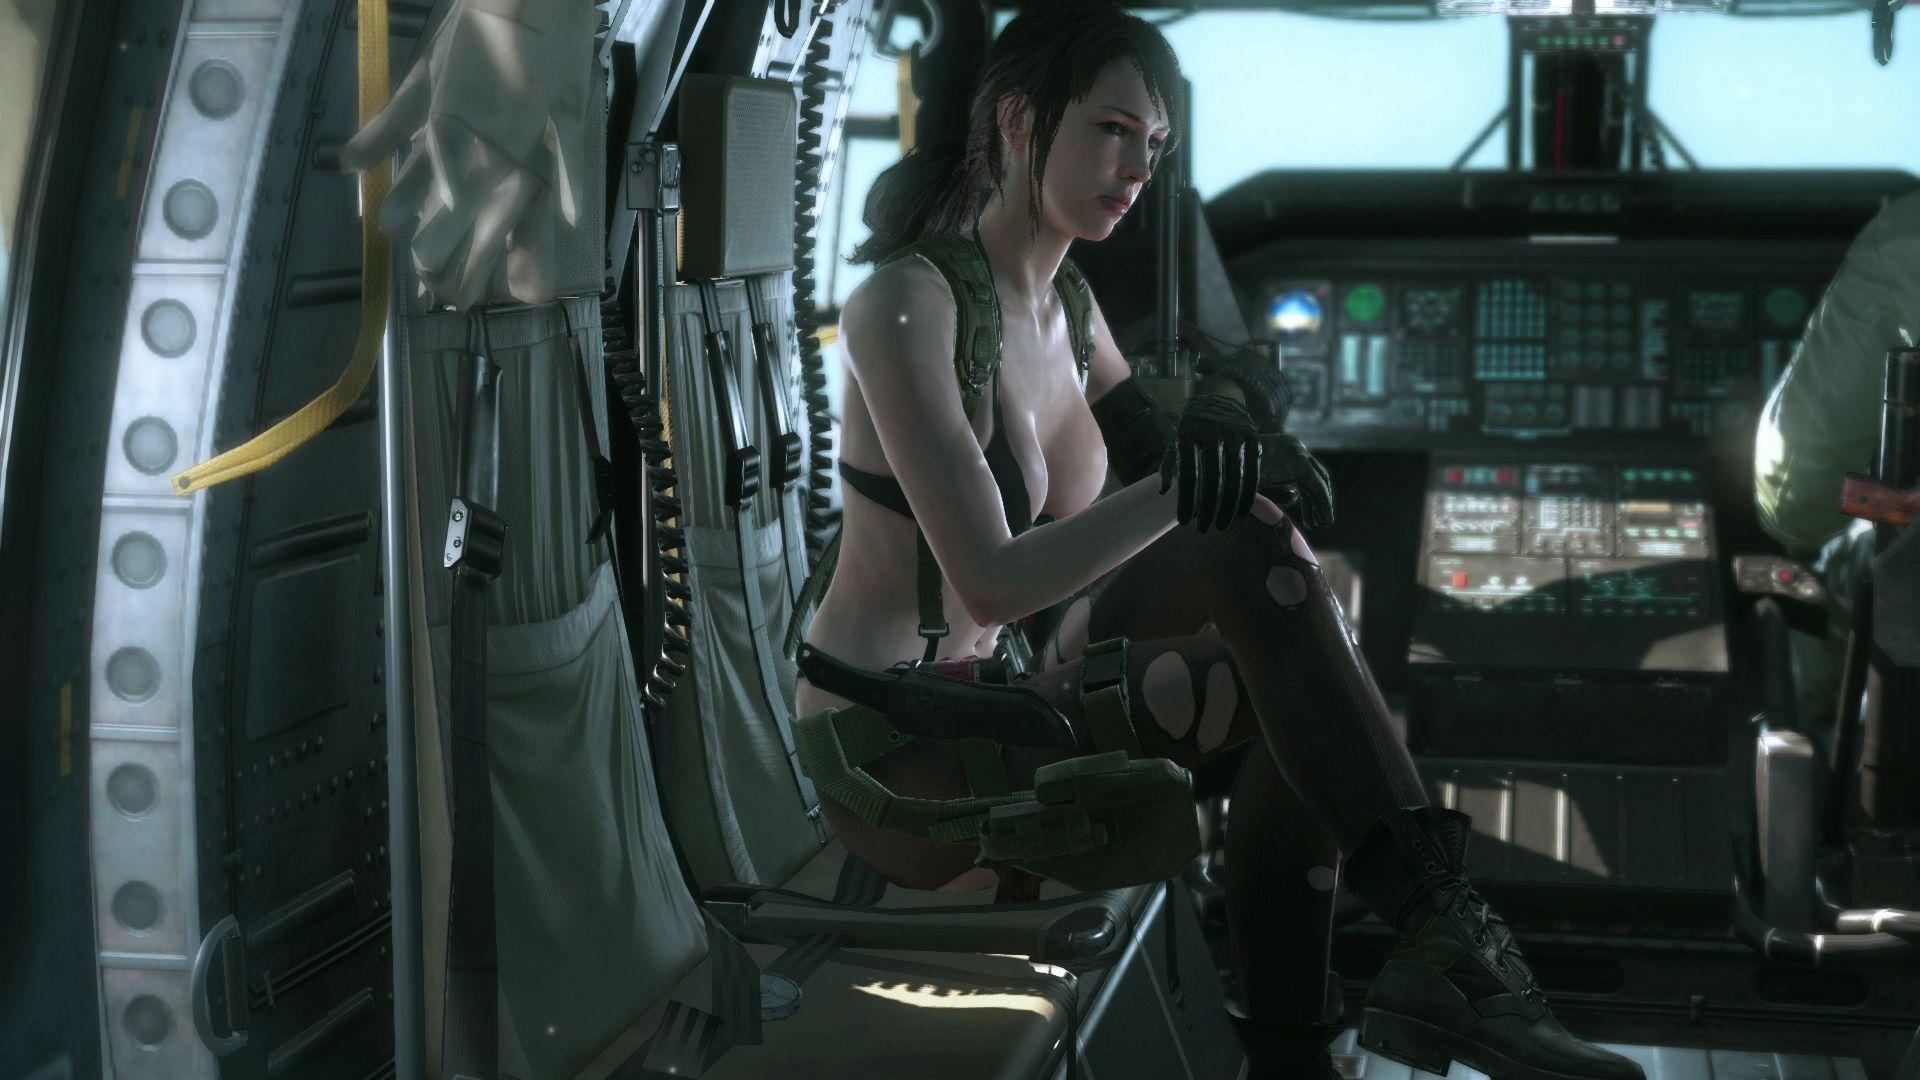 Spousta nových HD obrázků z Metal Gear Solid V: The Phantom Pain 110524